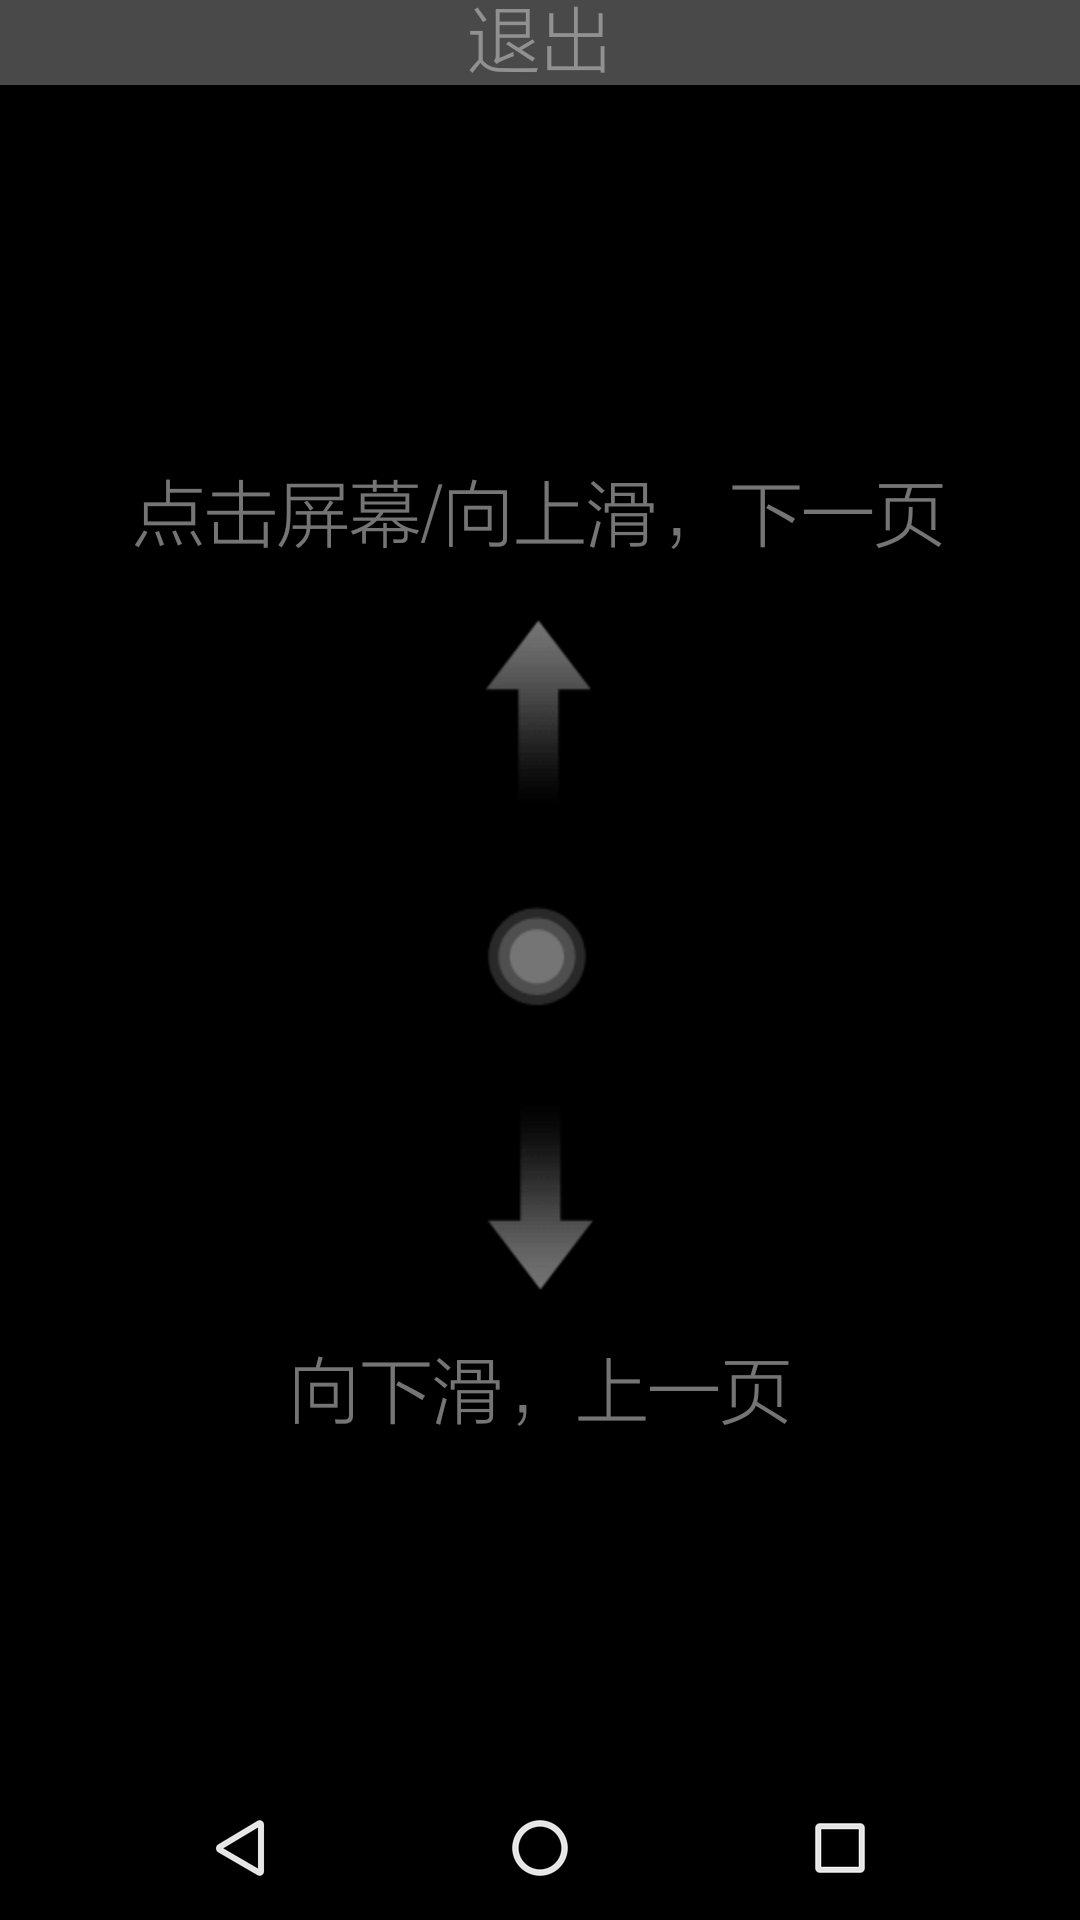 Screenshot_20170528-021357.png